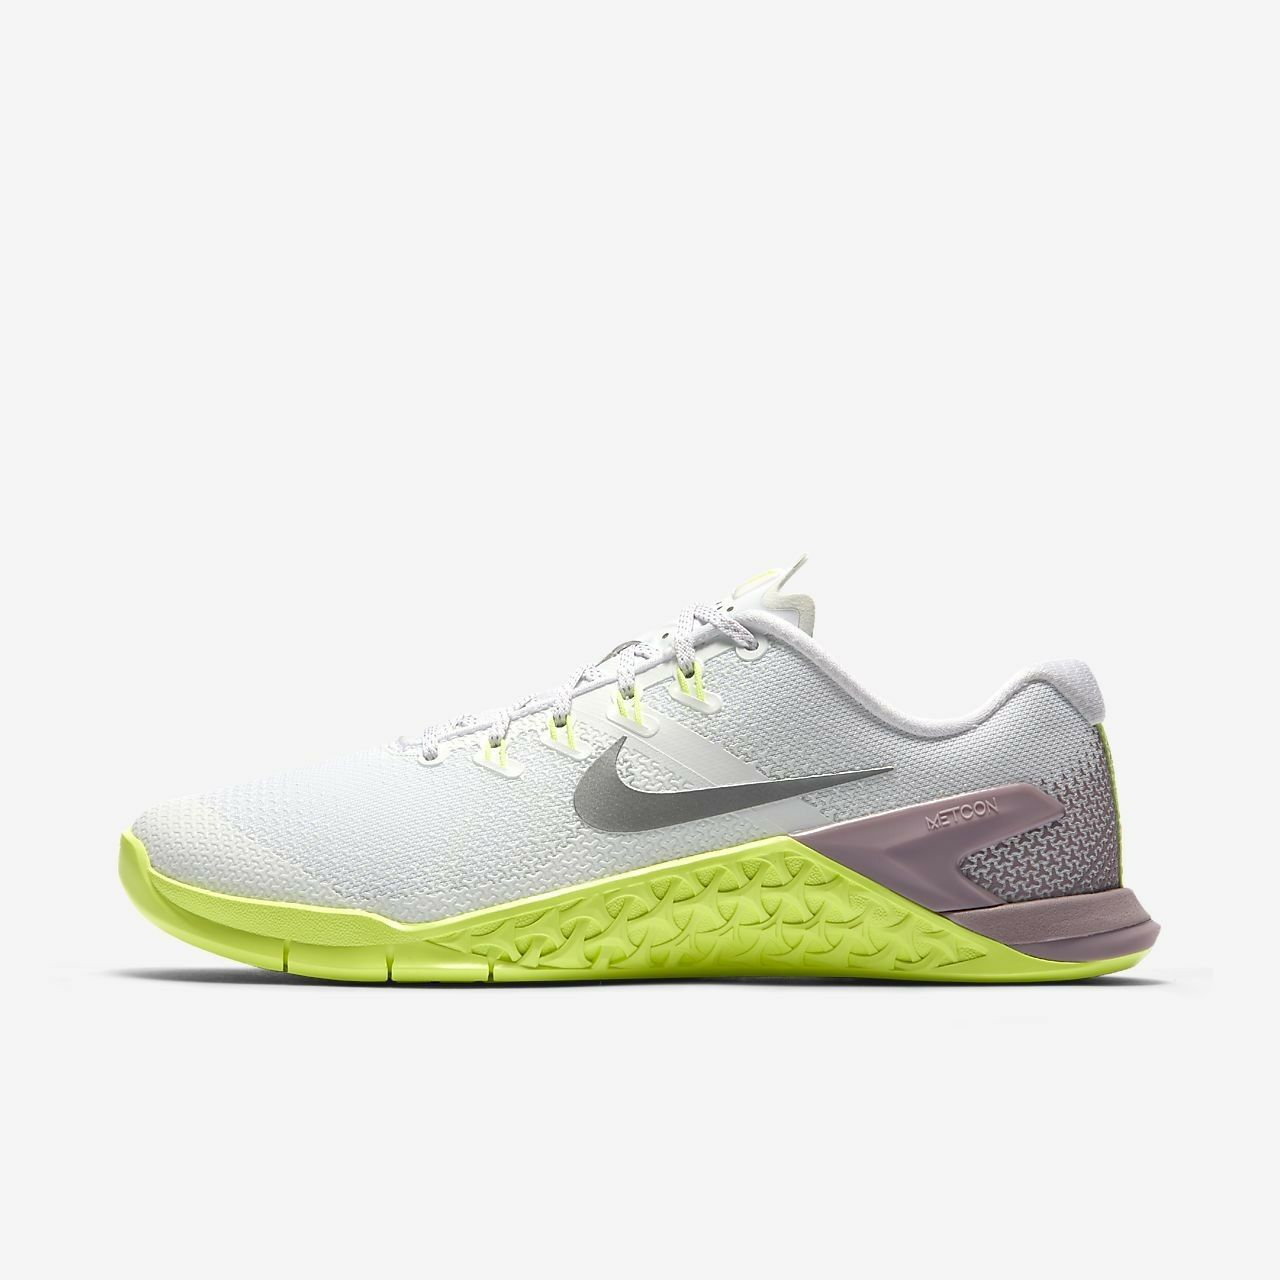 FEMMES Nike Metcon 4 Chaussures Blanc Argenté 924593 102 Pdsf